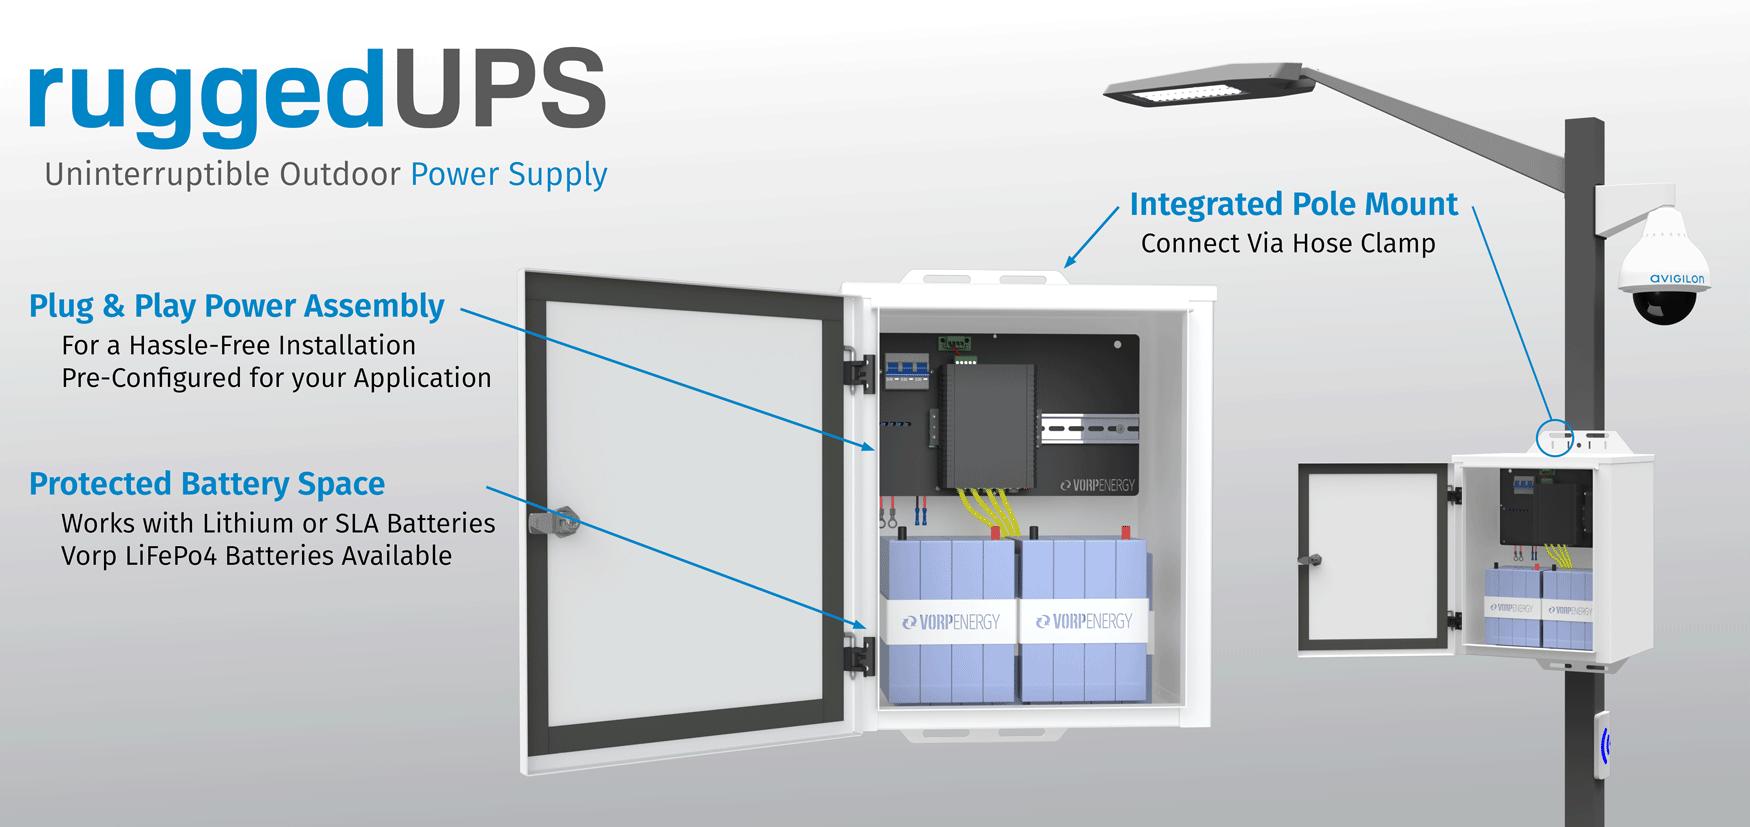 Avigilon Ups Slider 1750px Web Vorp Energy Apc Battery Backup Wiring Diagram Surveillance Power For